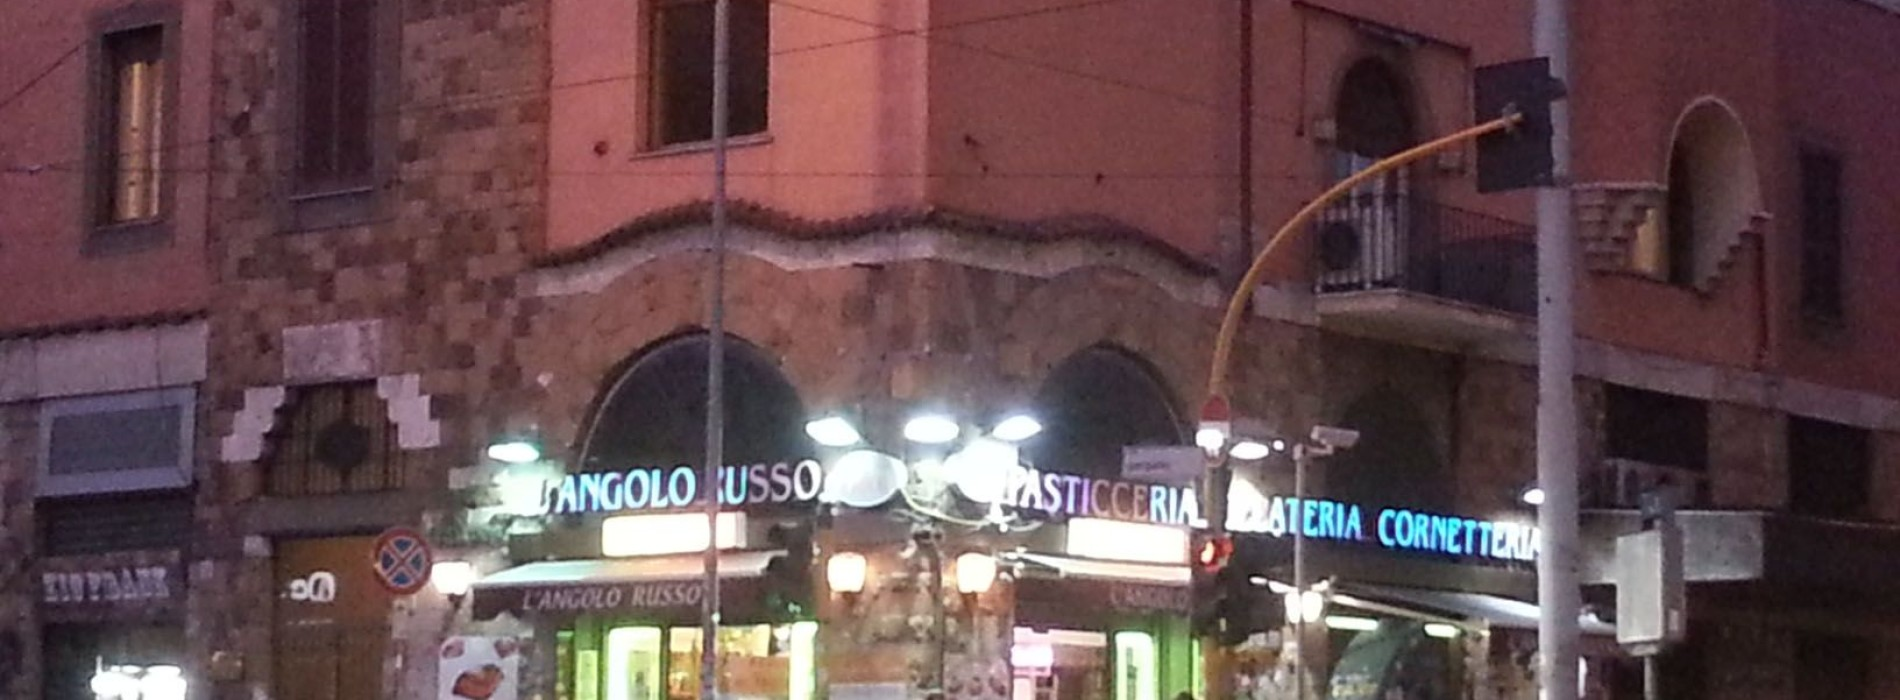 Mangiare e vivere a Monte Sacro / Pizzerie, beer shop e street food, tra l'Aniene e la Nomentana